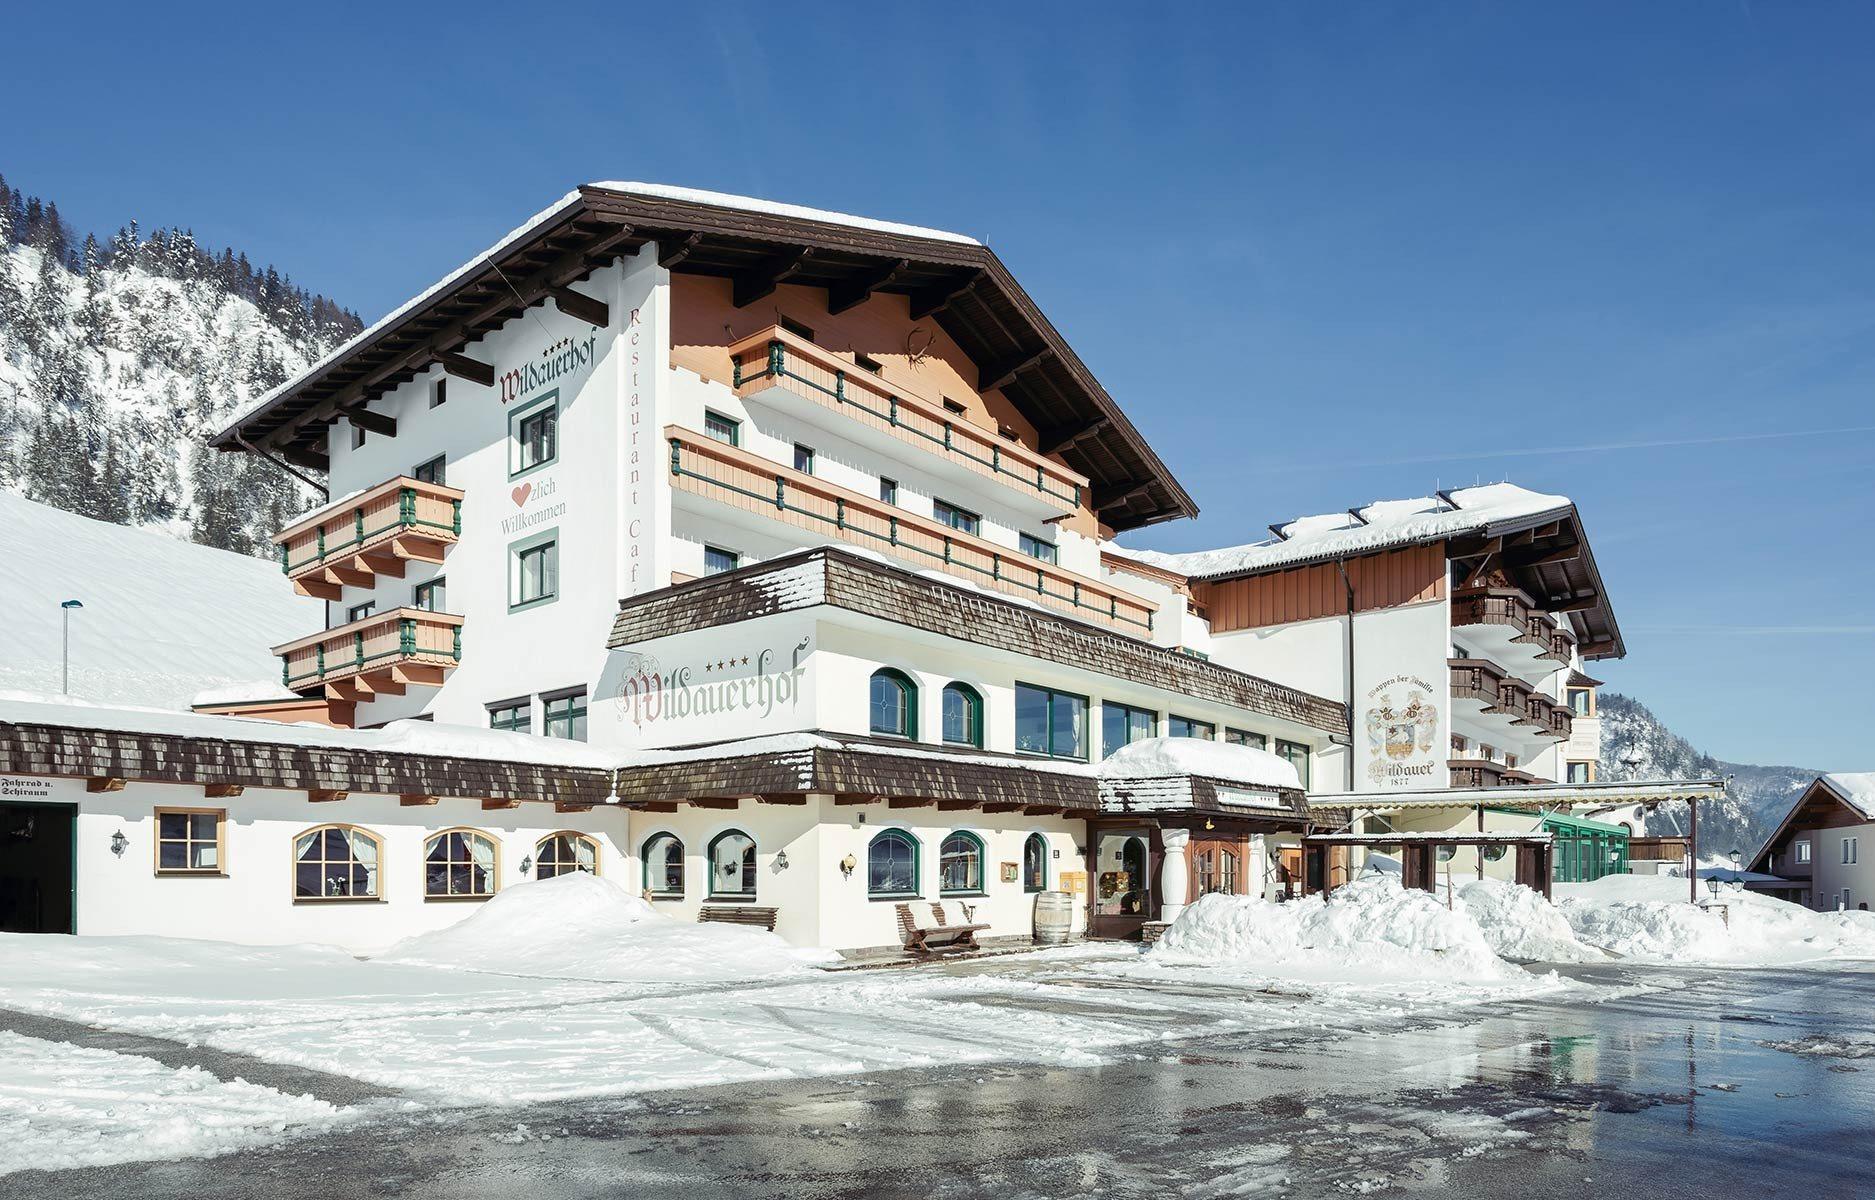 Hotel Wildauerhof Tirol